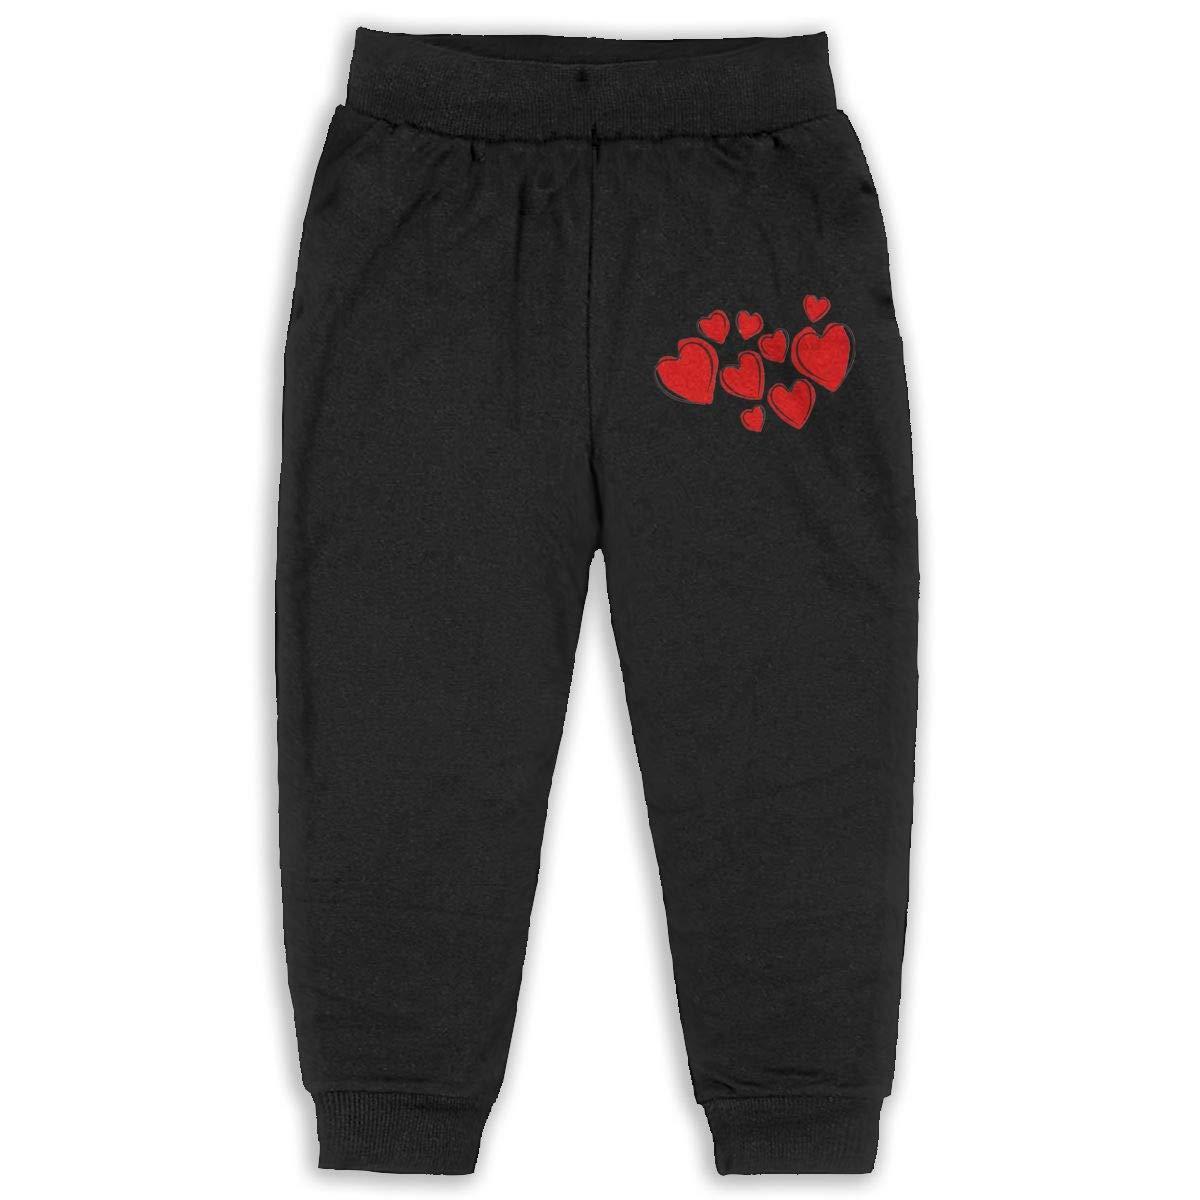 LFCLOSET Valentines Day Hearts Pattern Children Active Jogger Sweatpants Basic Elastic Sport Pants Black